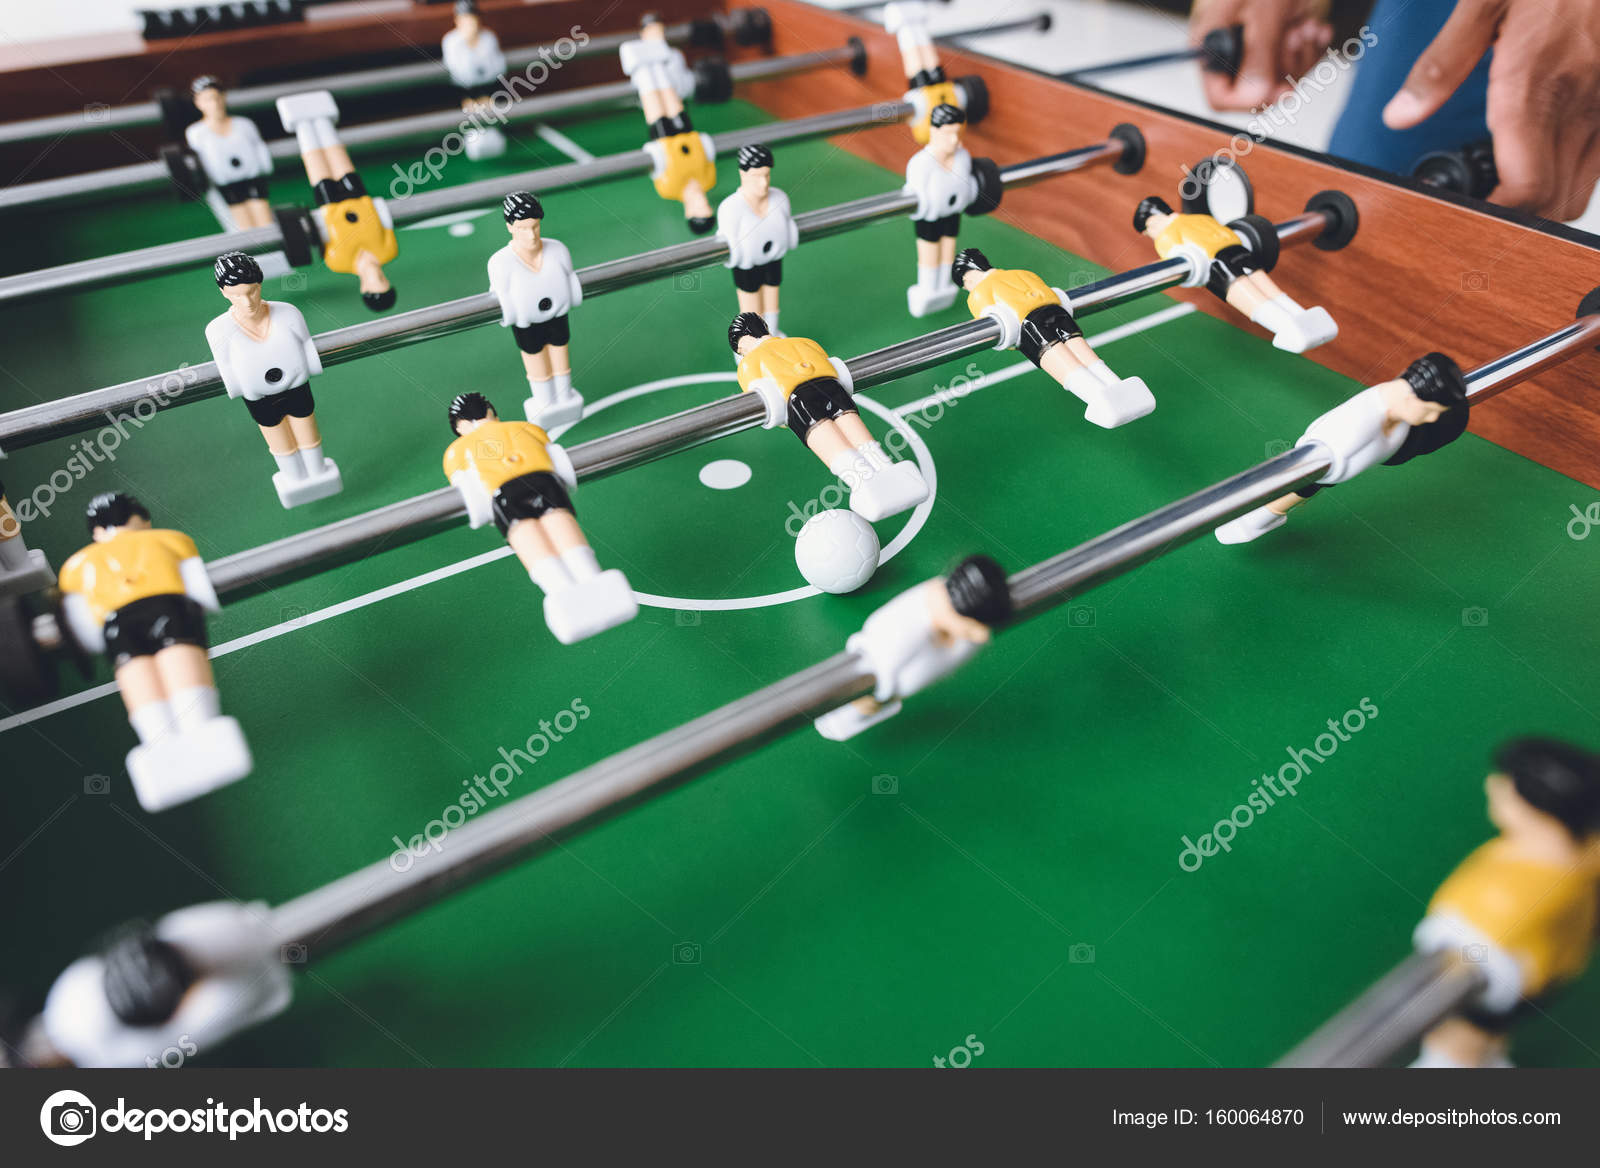 depositphotos_160064870-stockafbeelding-man-tafelvoetbal-spelen